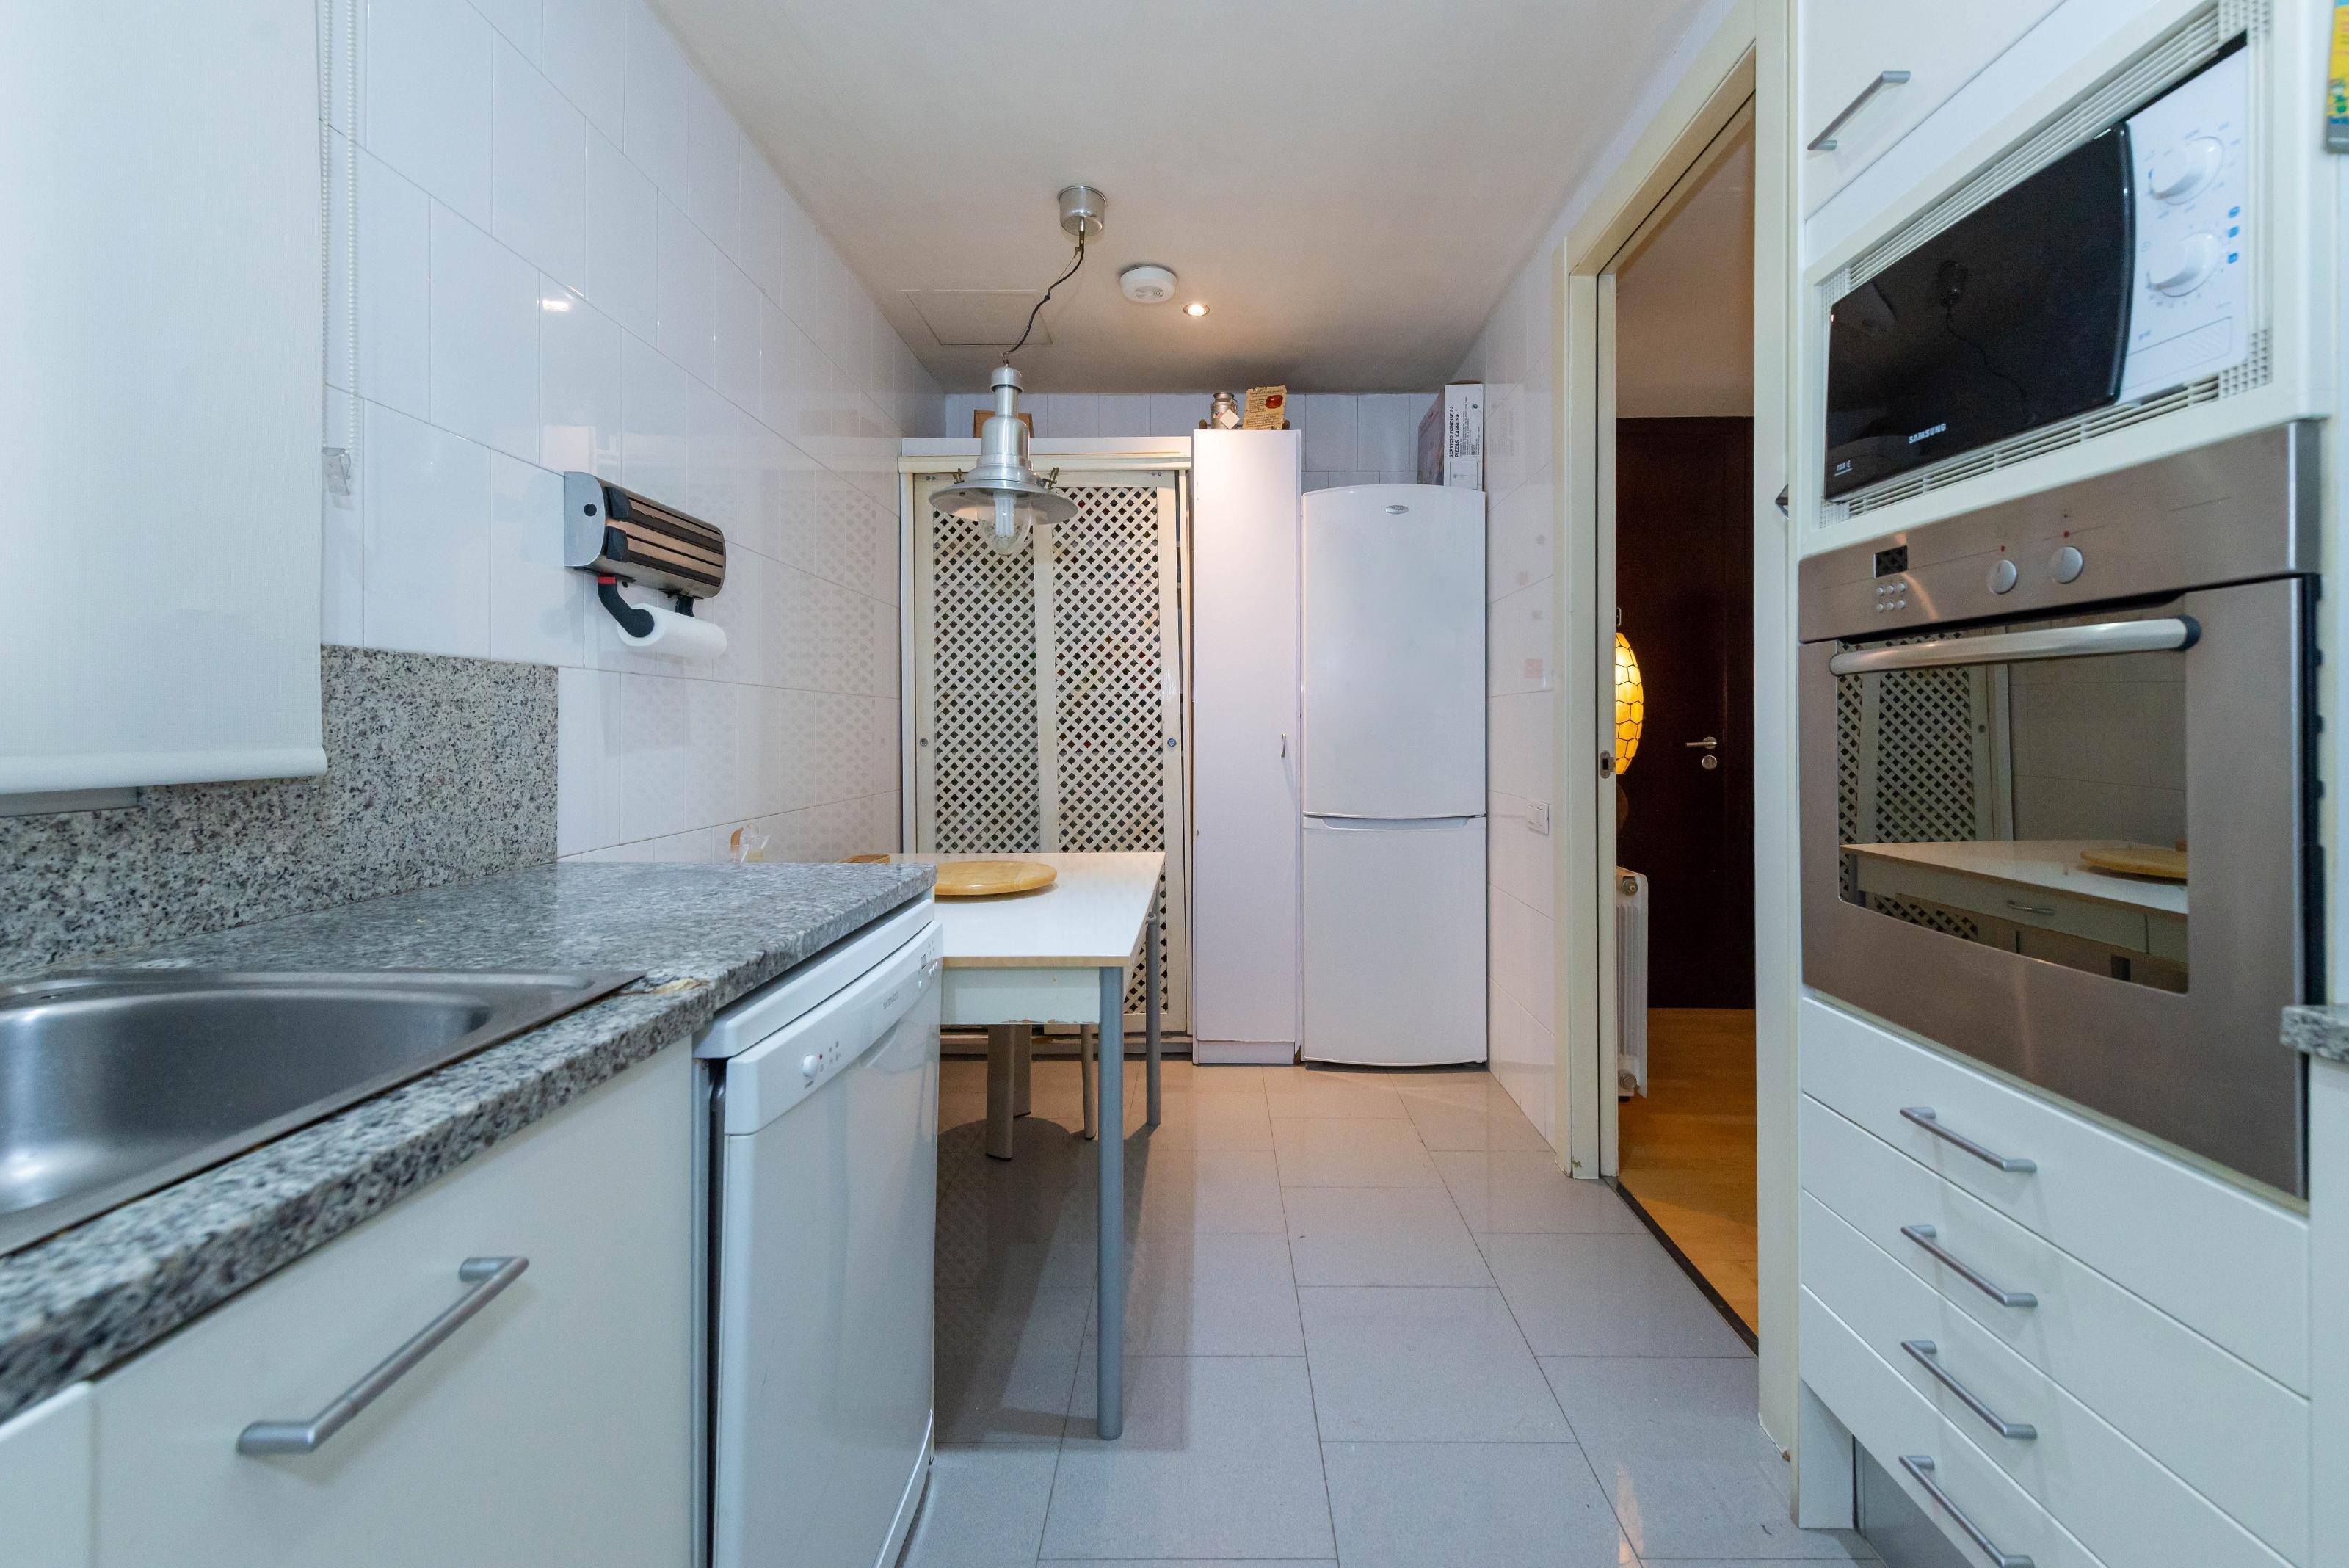 246281 Flat for sale in Sarrià-Sant Gervasi, Tres Torres 14